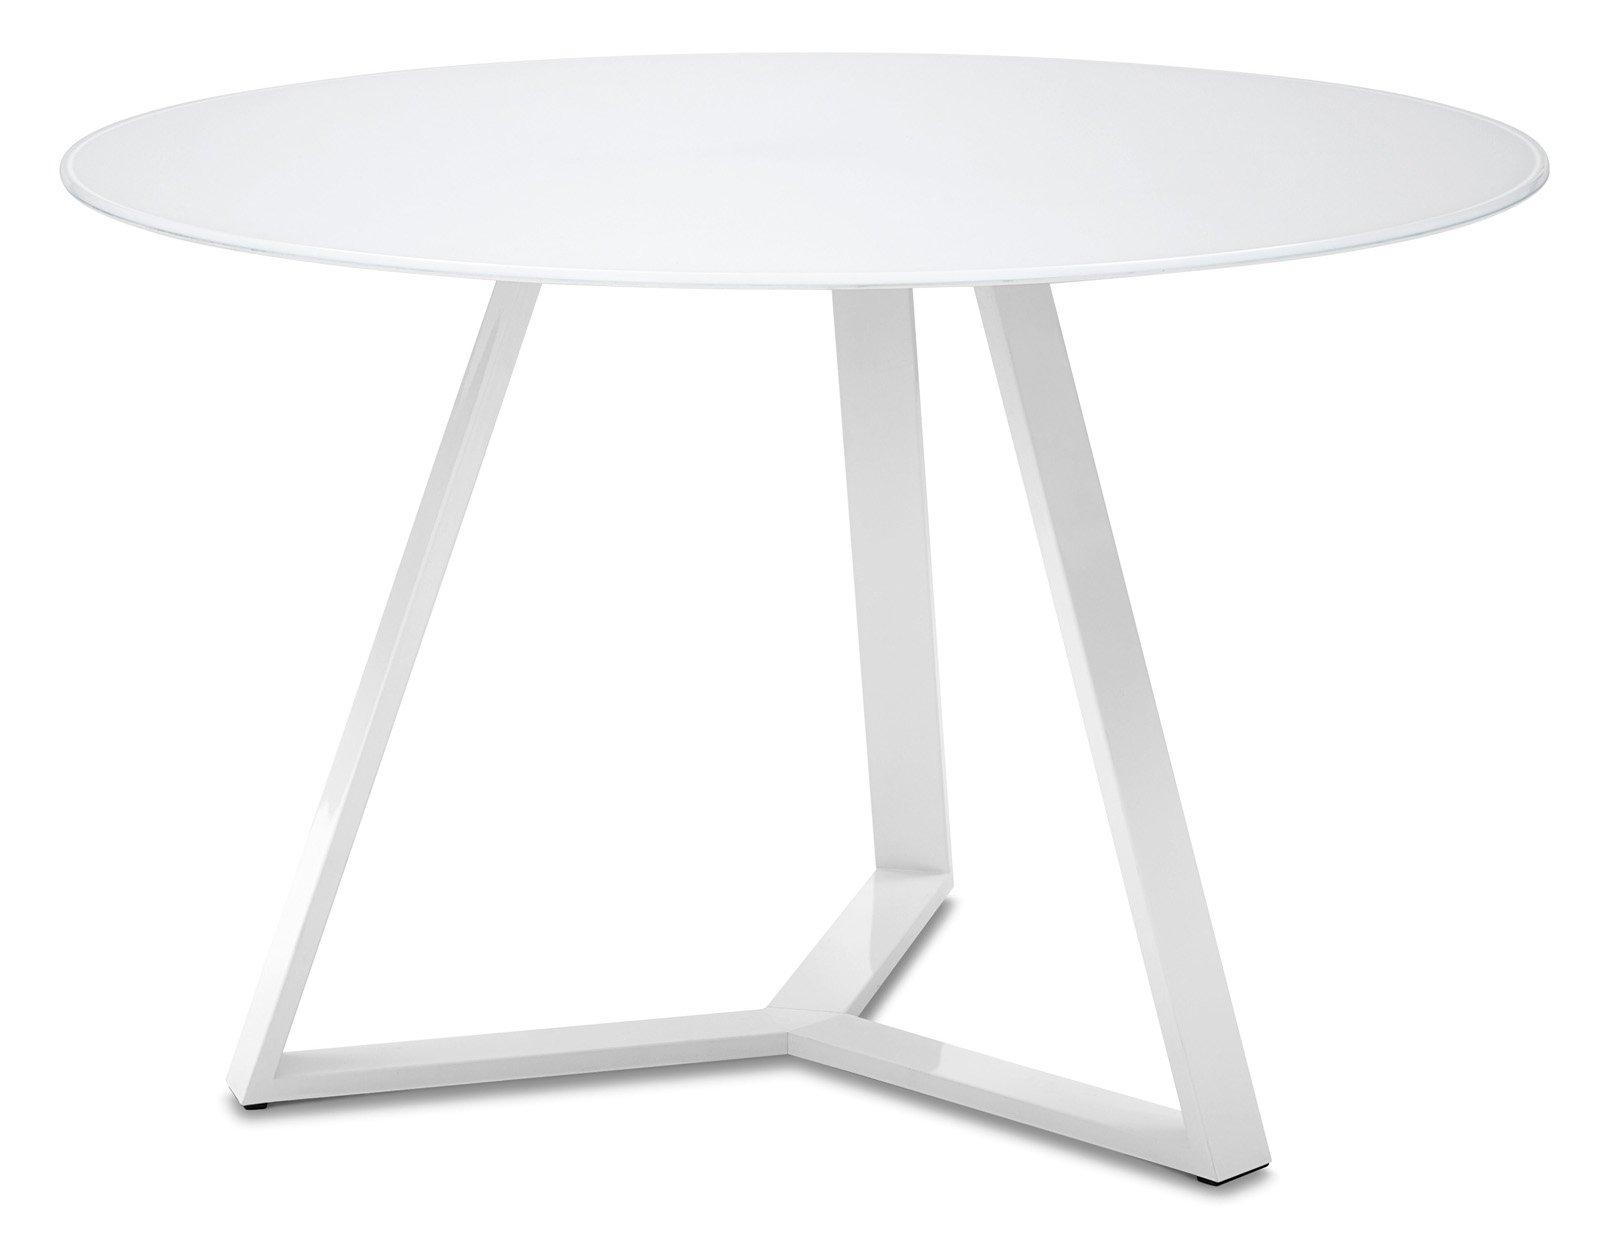 Idee lavanderia decoracion - Tavolo rotondo allungabile bianco ...